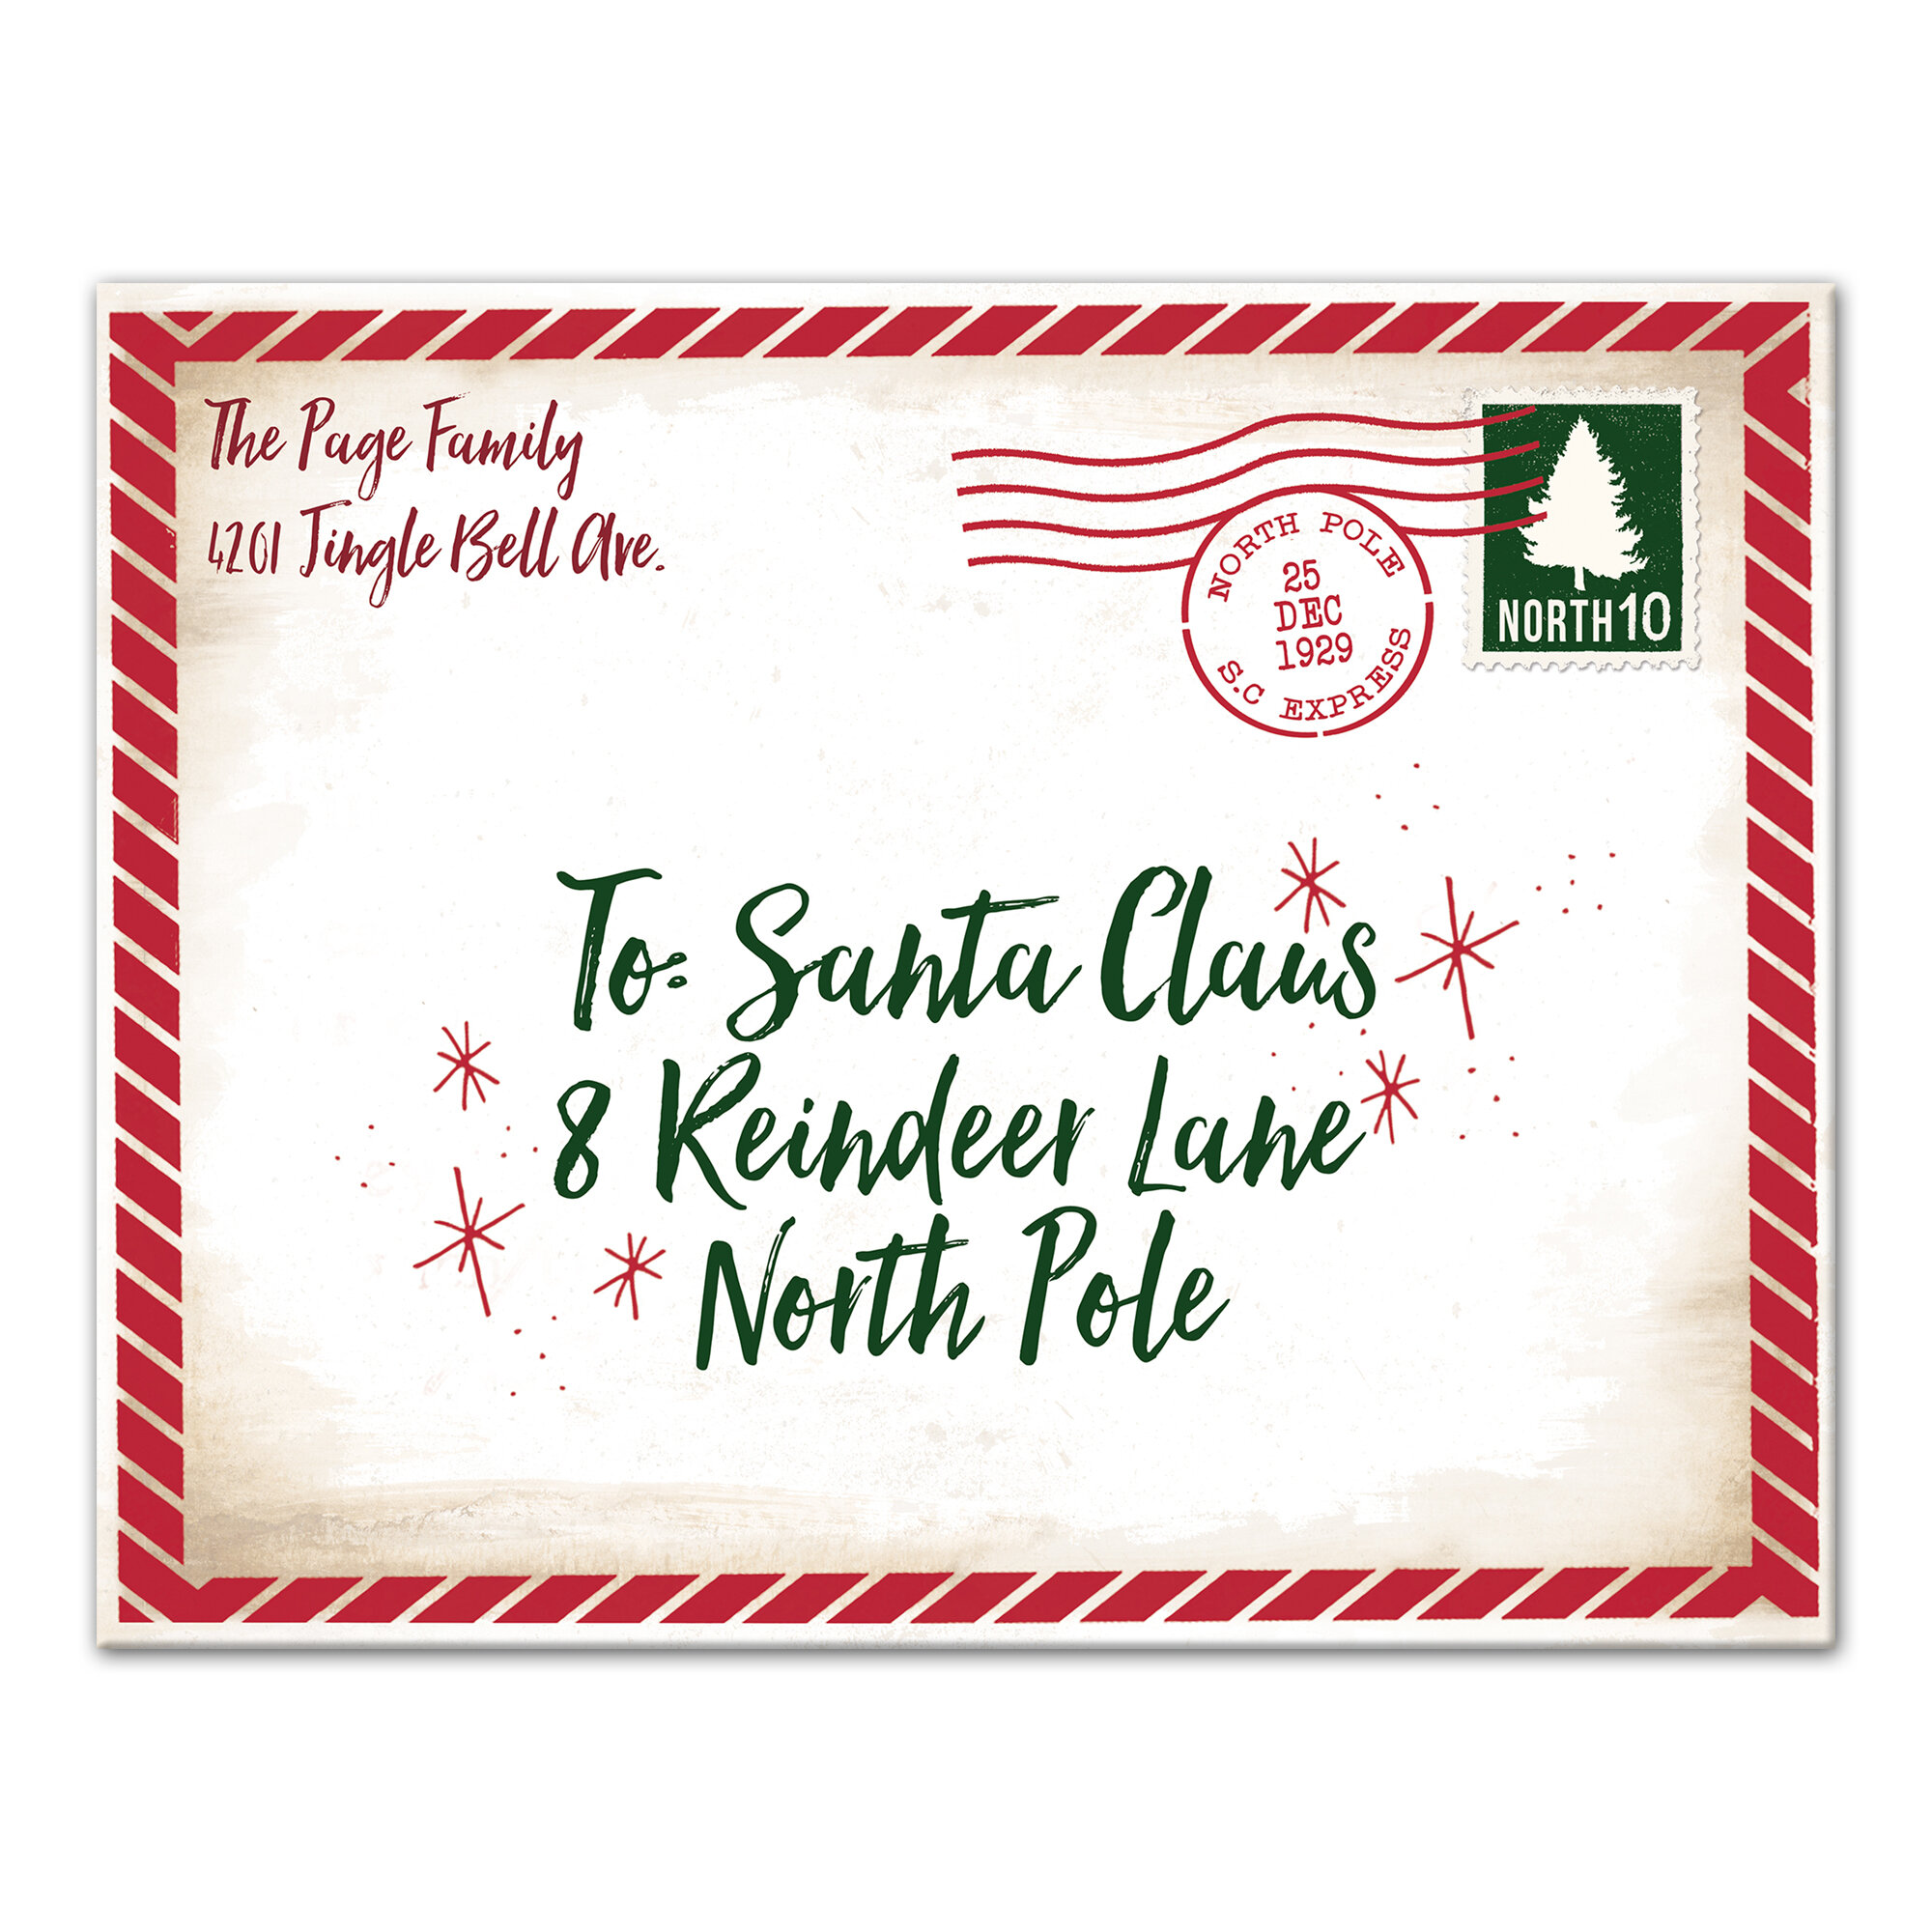 designs direct creative group dear santa envelope textual art on